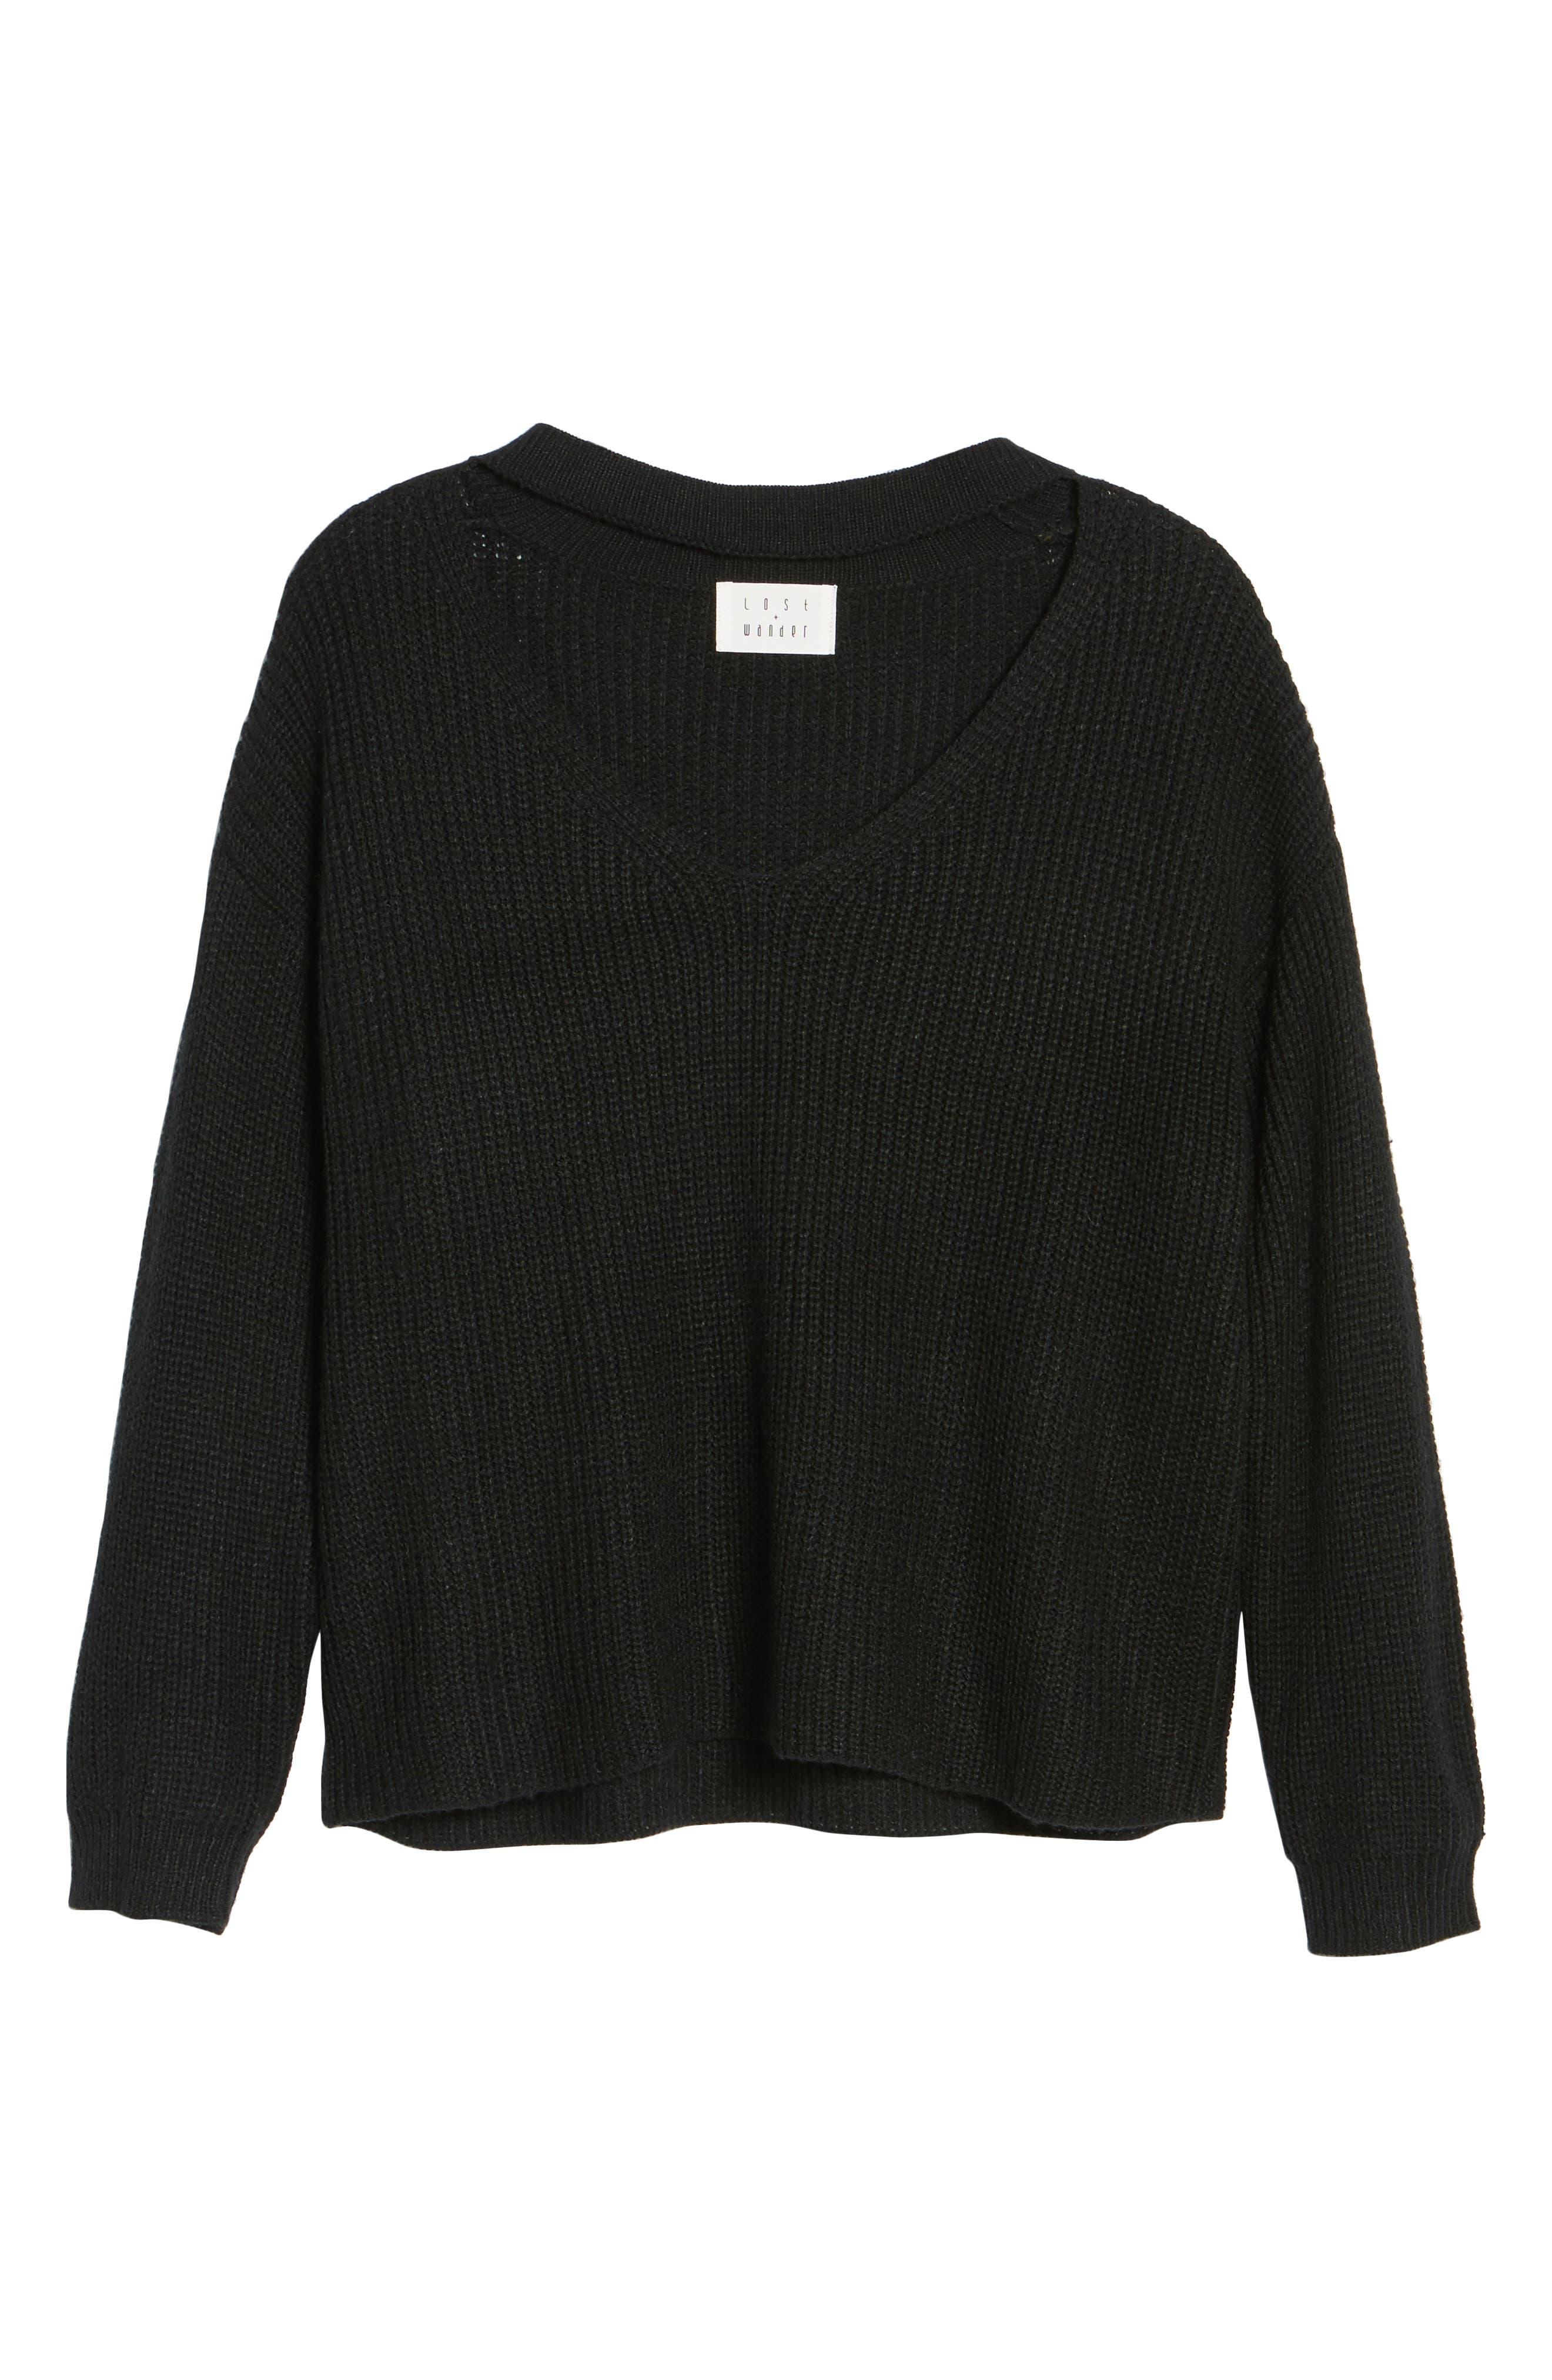 Madison Cutout Sweater,                             Alternate thumbnail 6, color,                             001